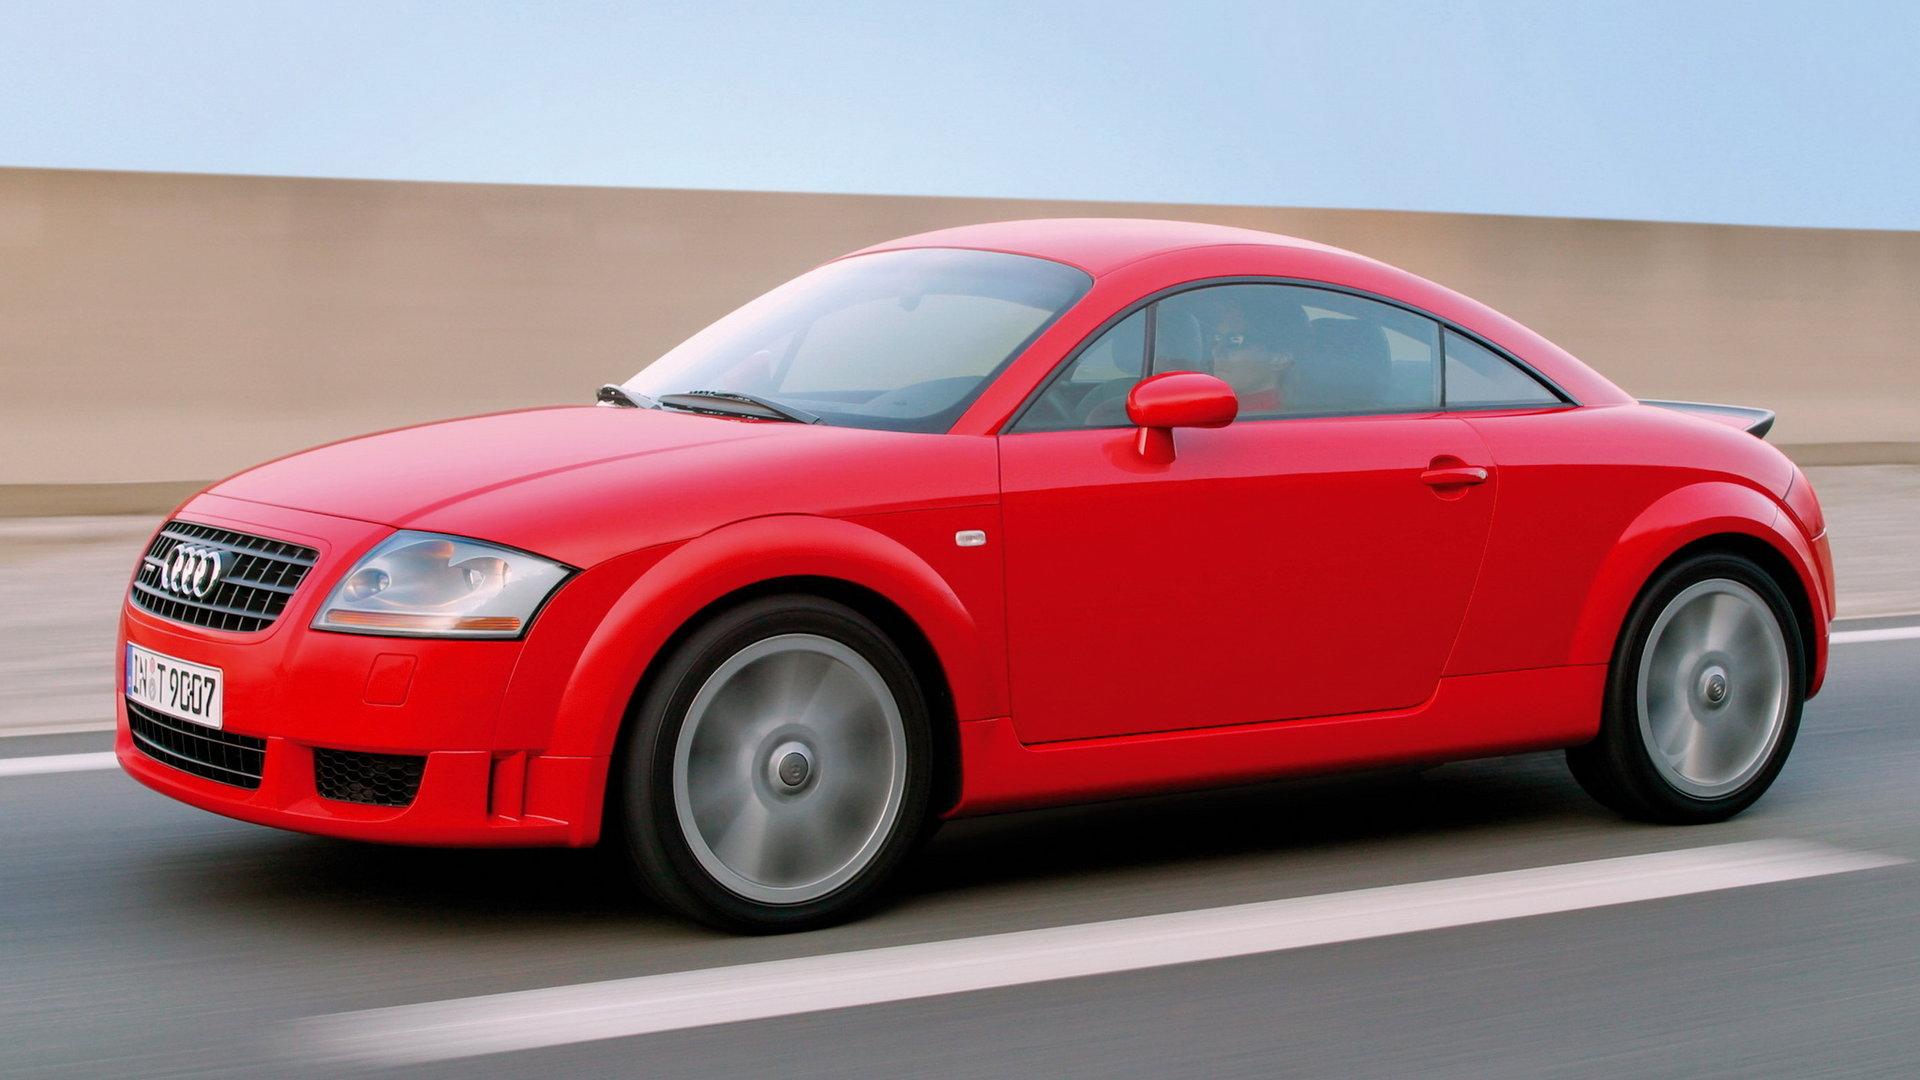 Coche del día: Audi TT 1.8t 225 quattro